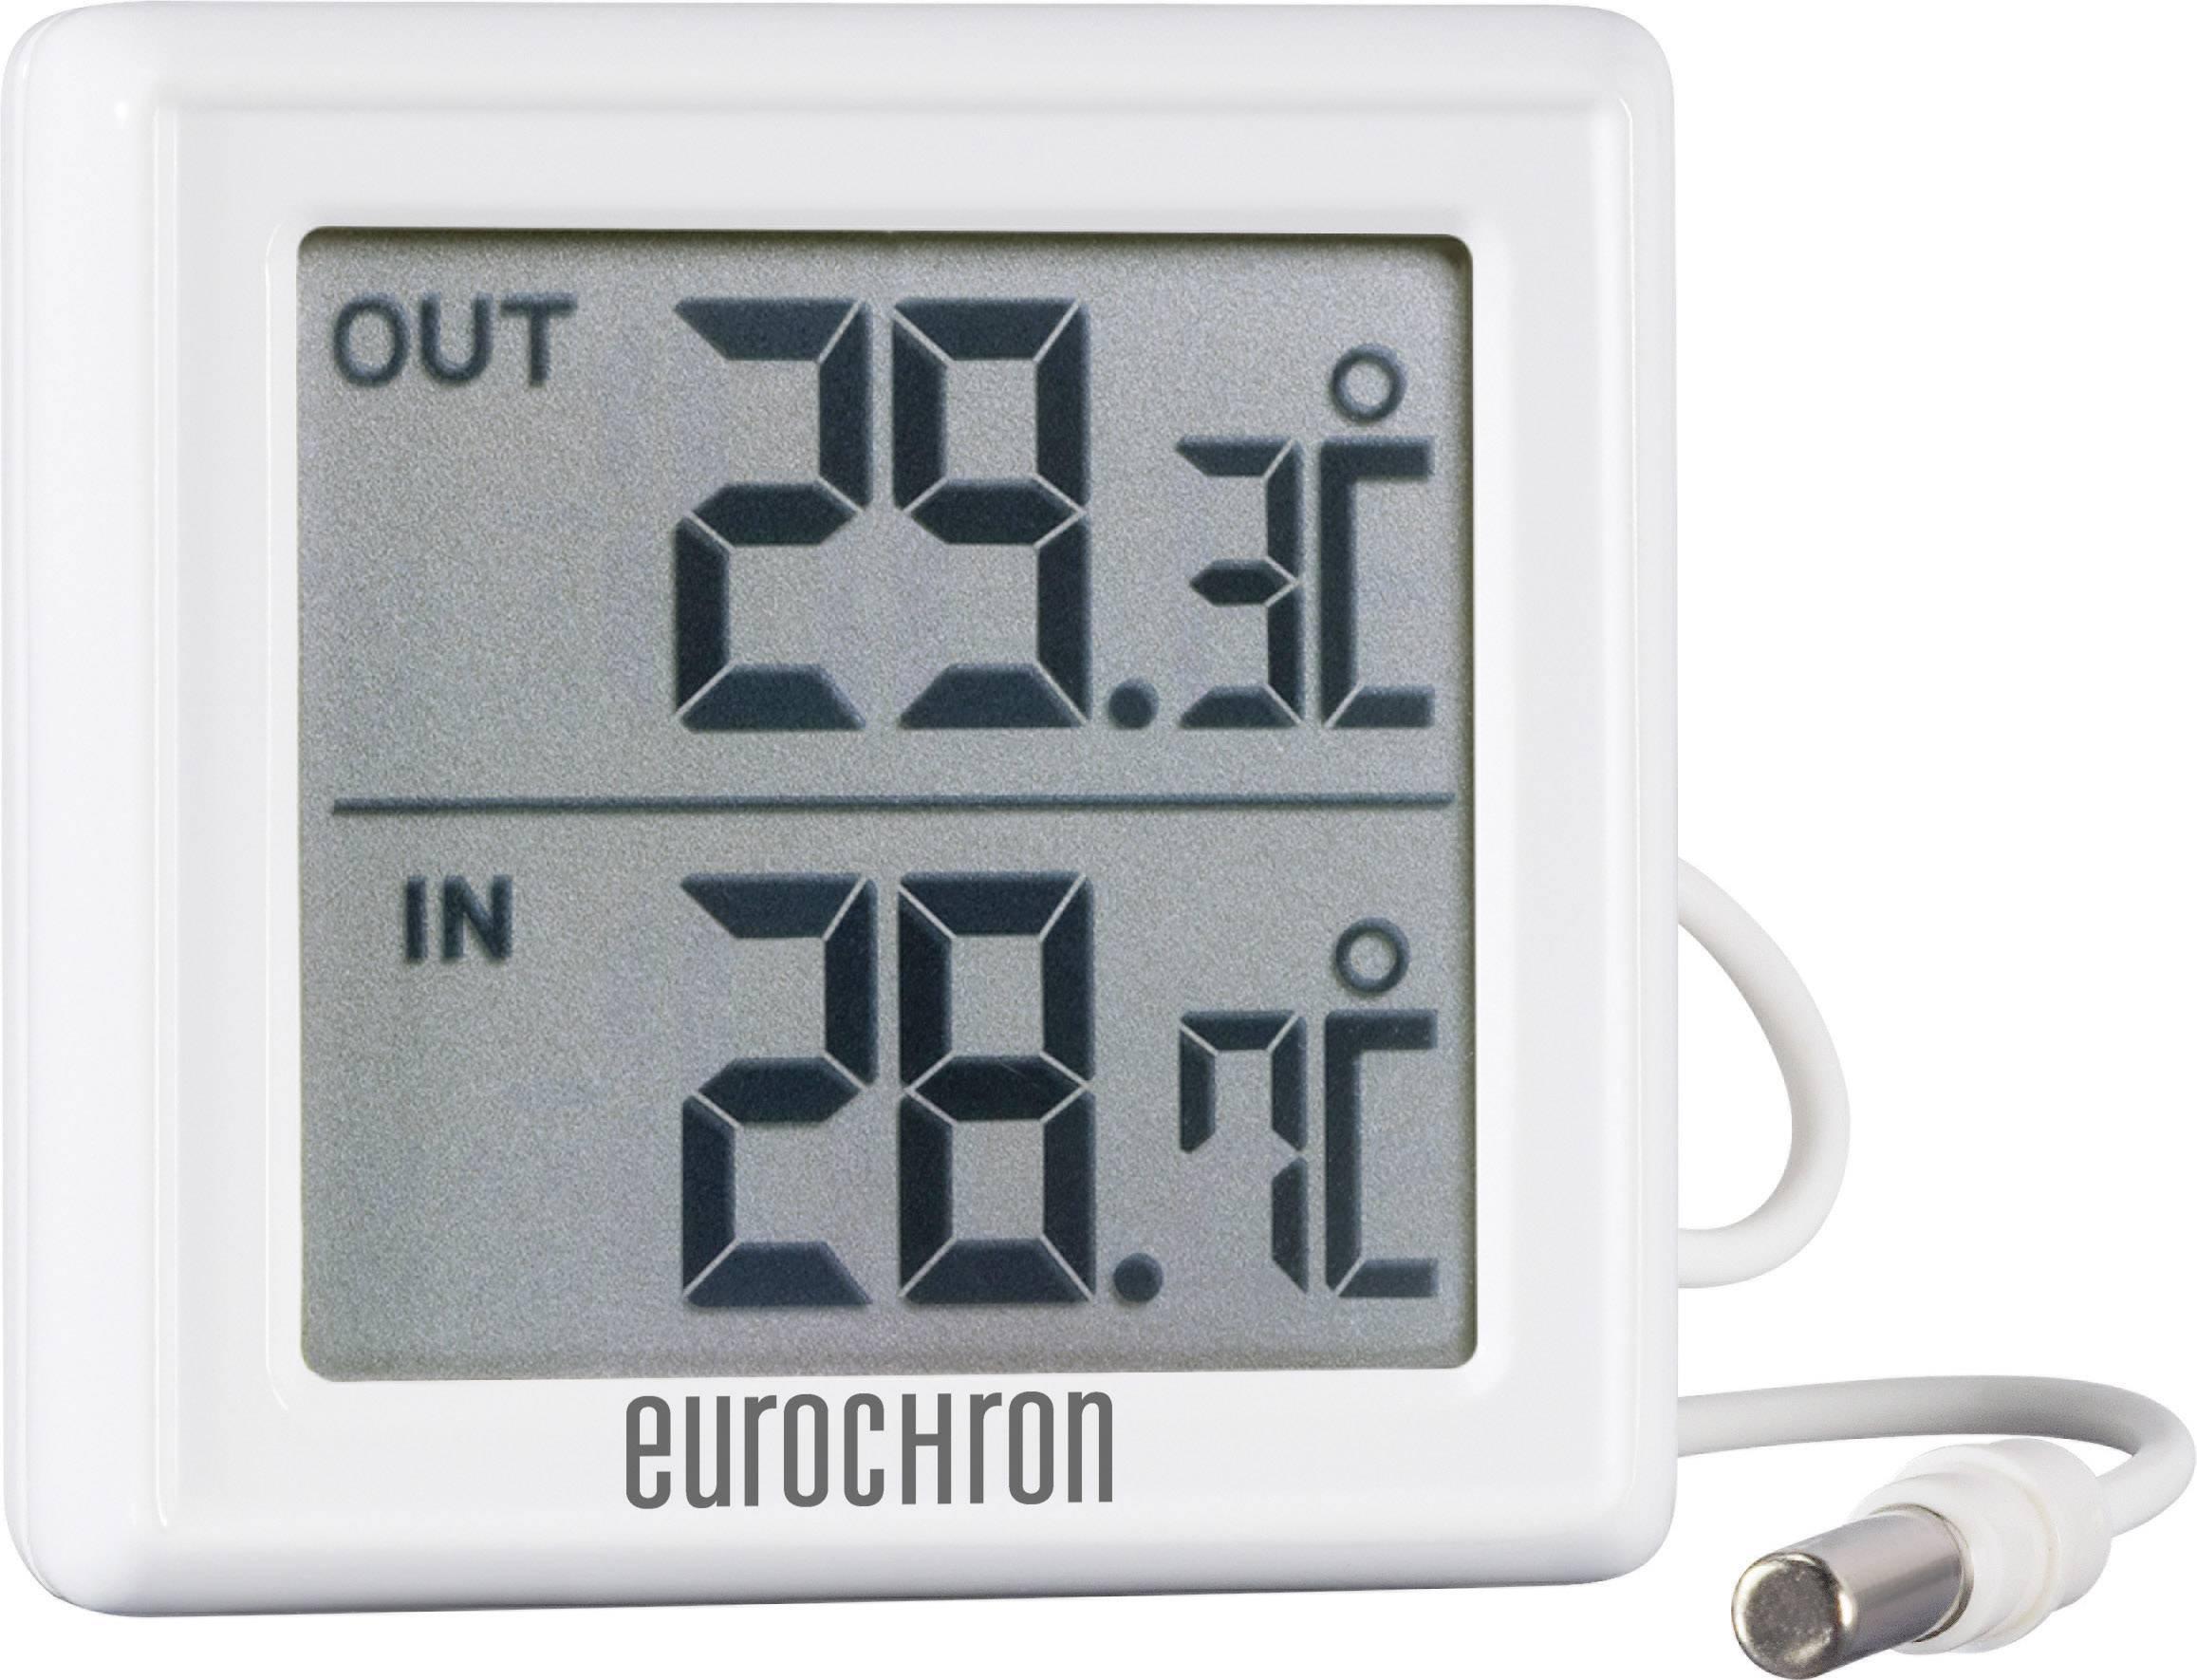 Mini teplomer, Eurochron ETH 5200